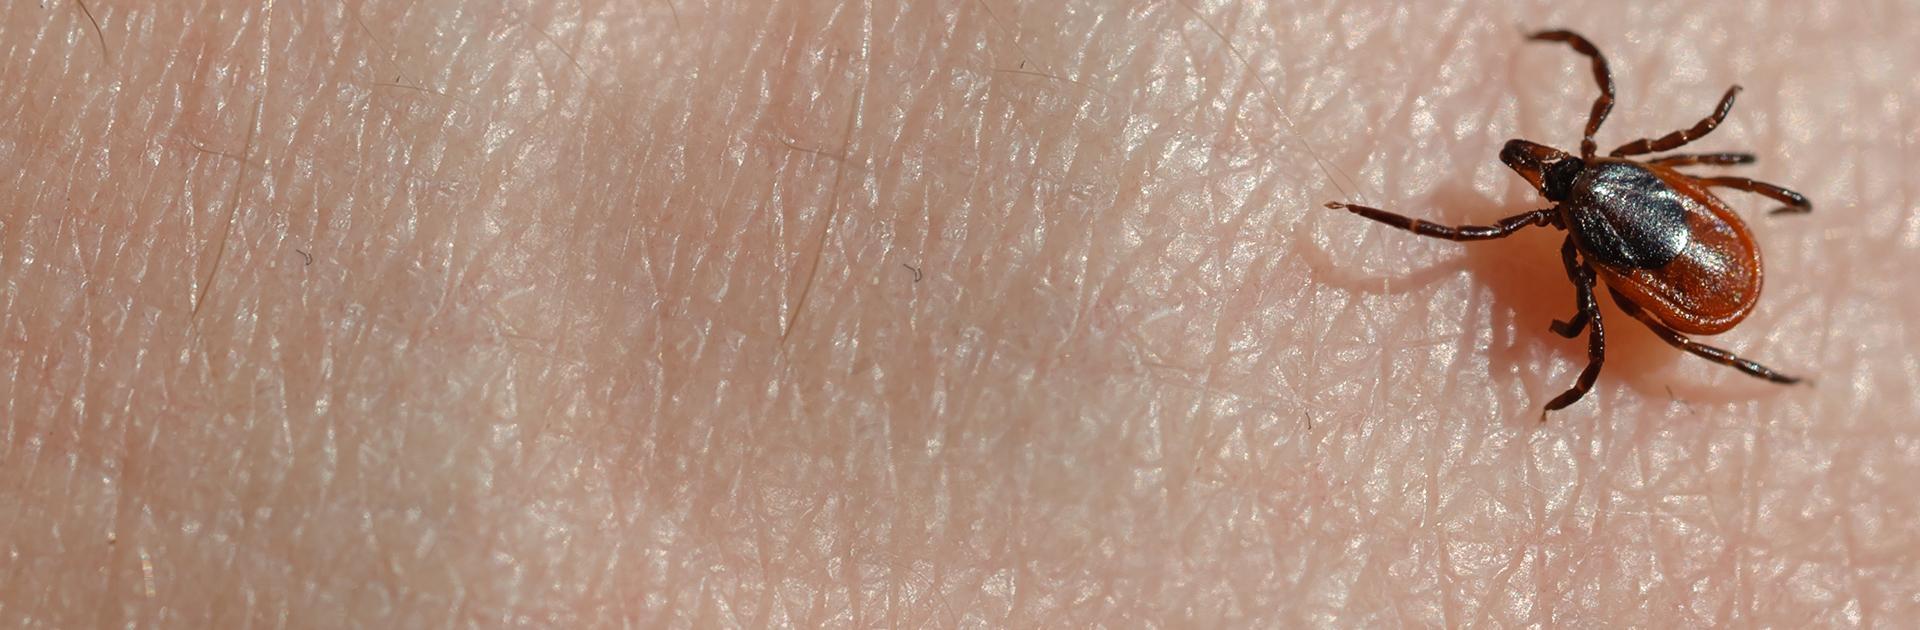 deer tick crawling on skin